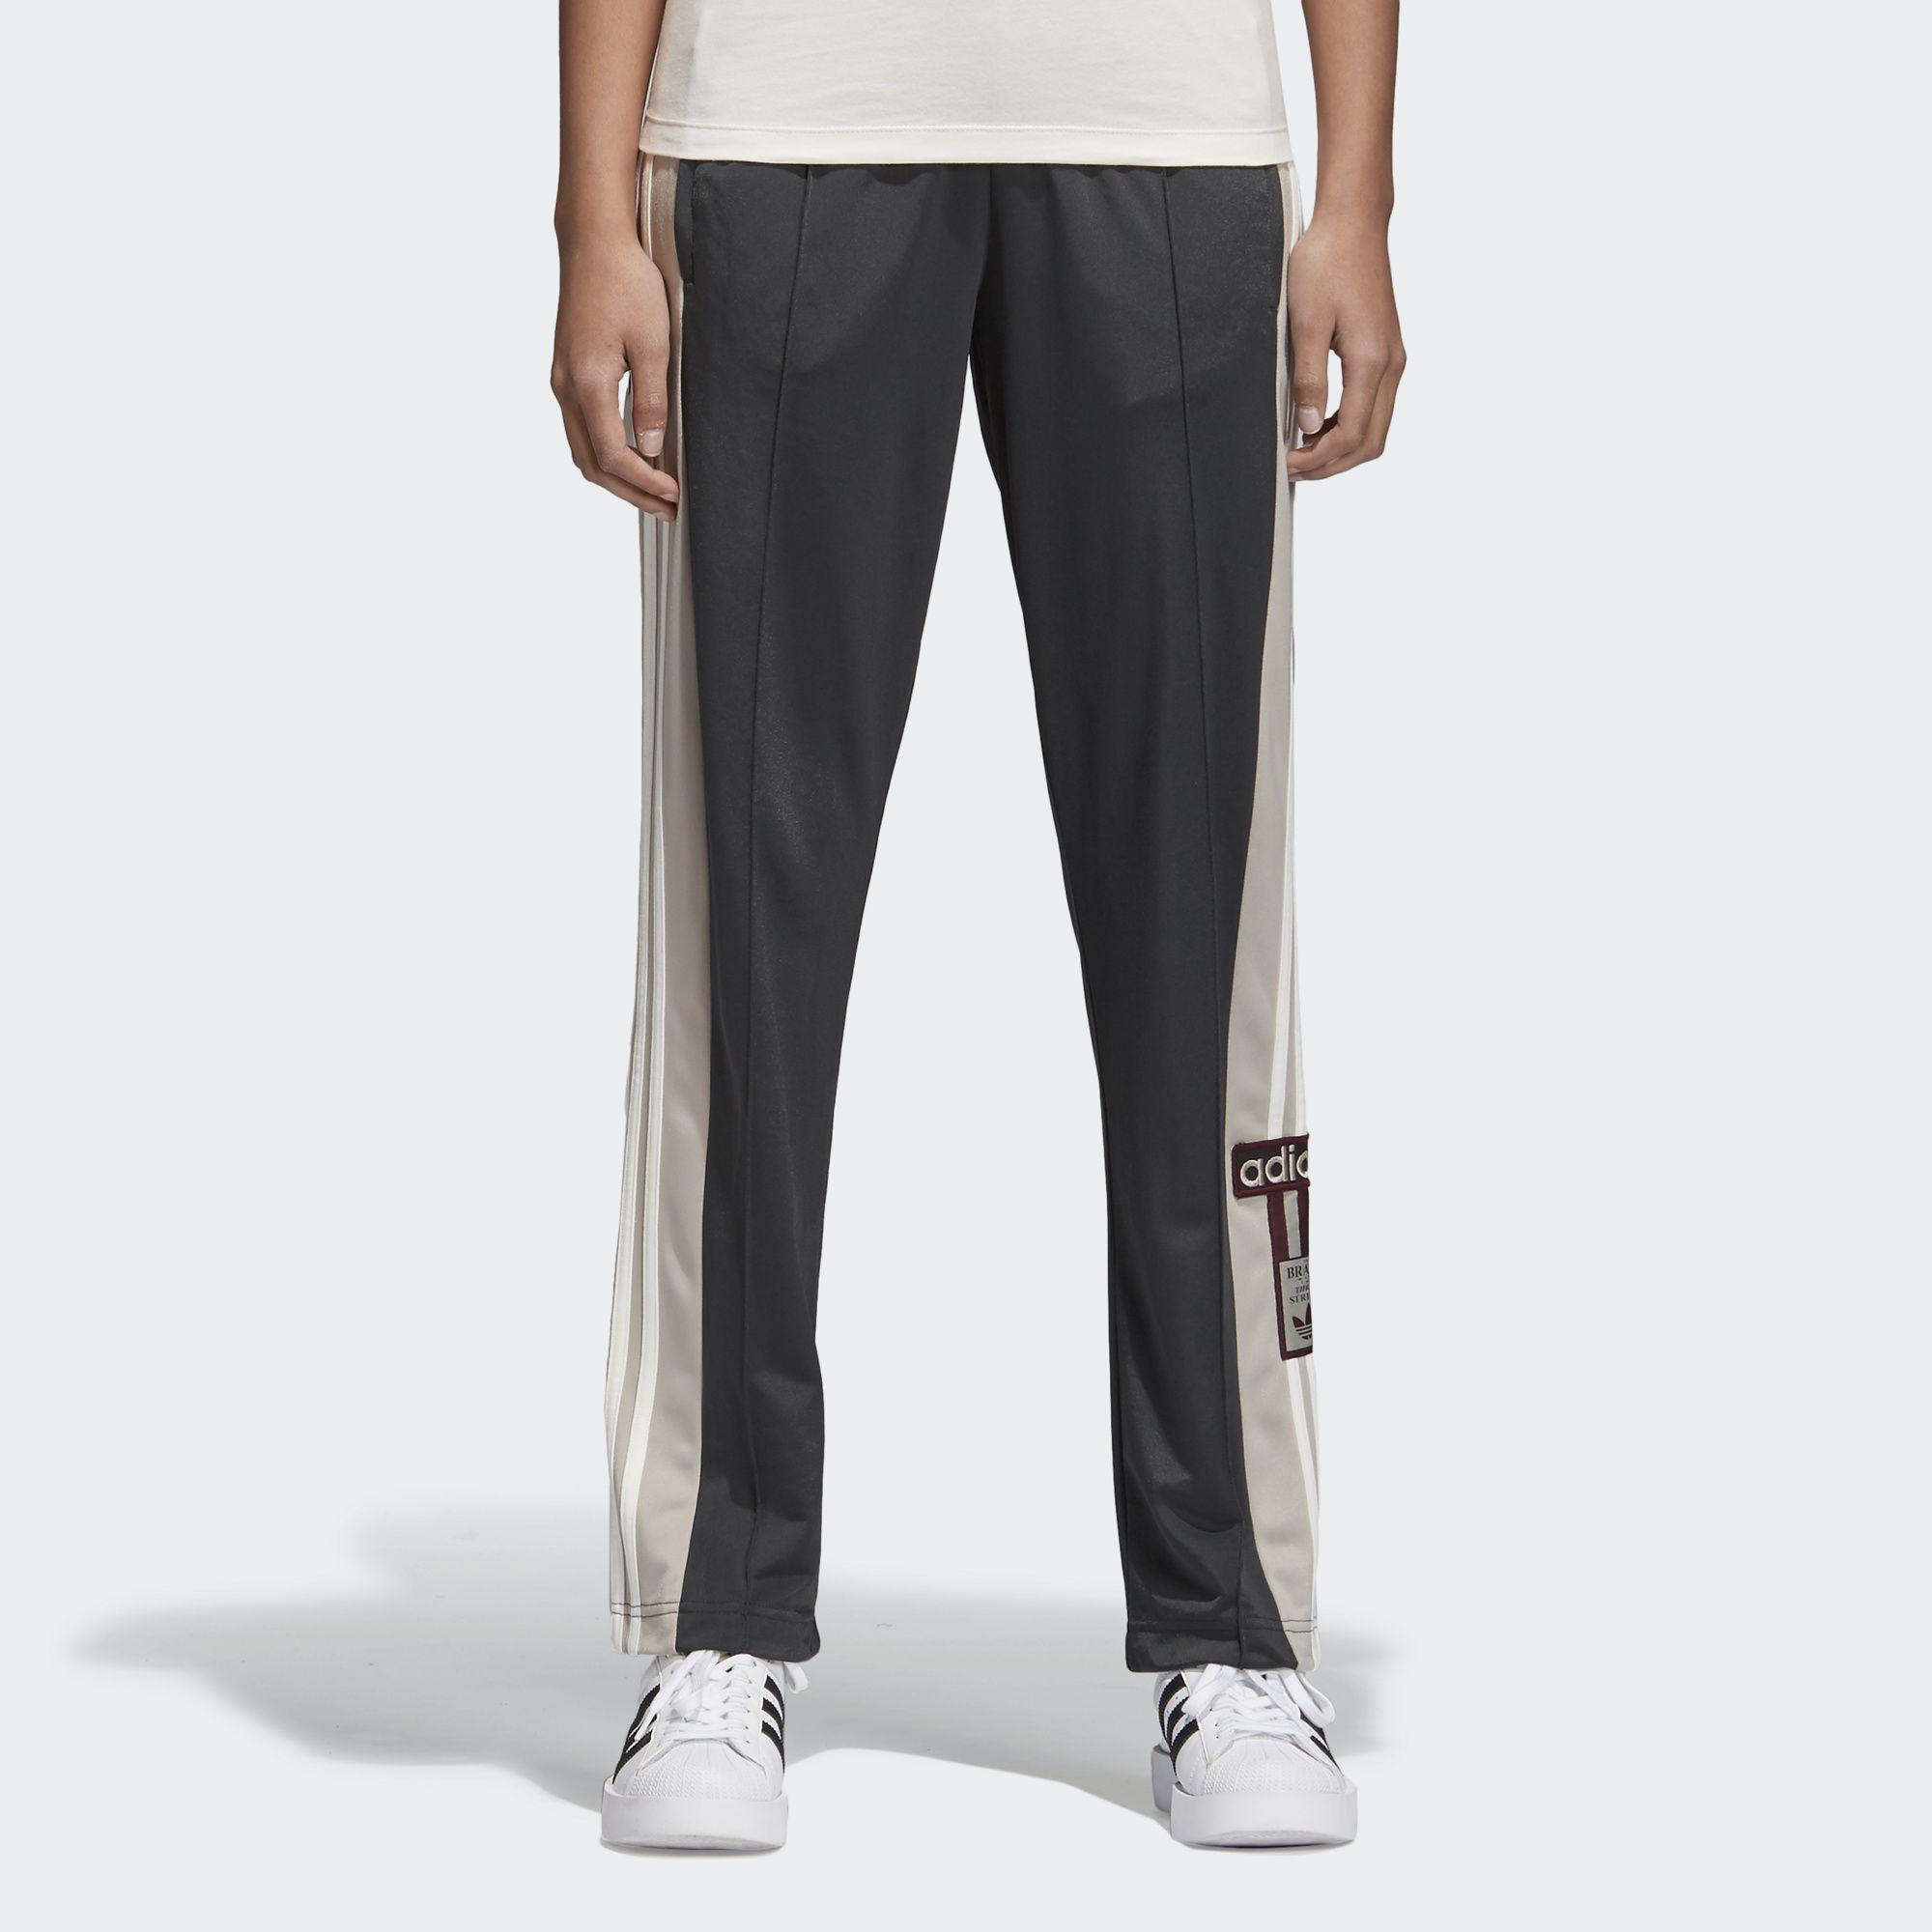 adidas originals Adibreak Track Pants Dame Black Carbon